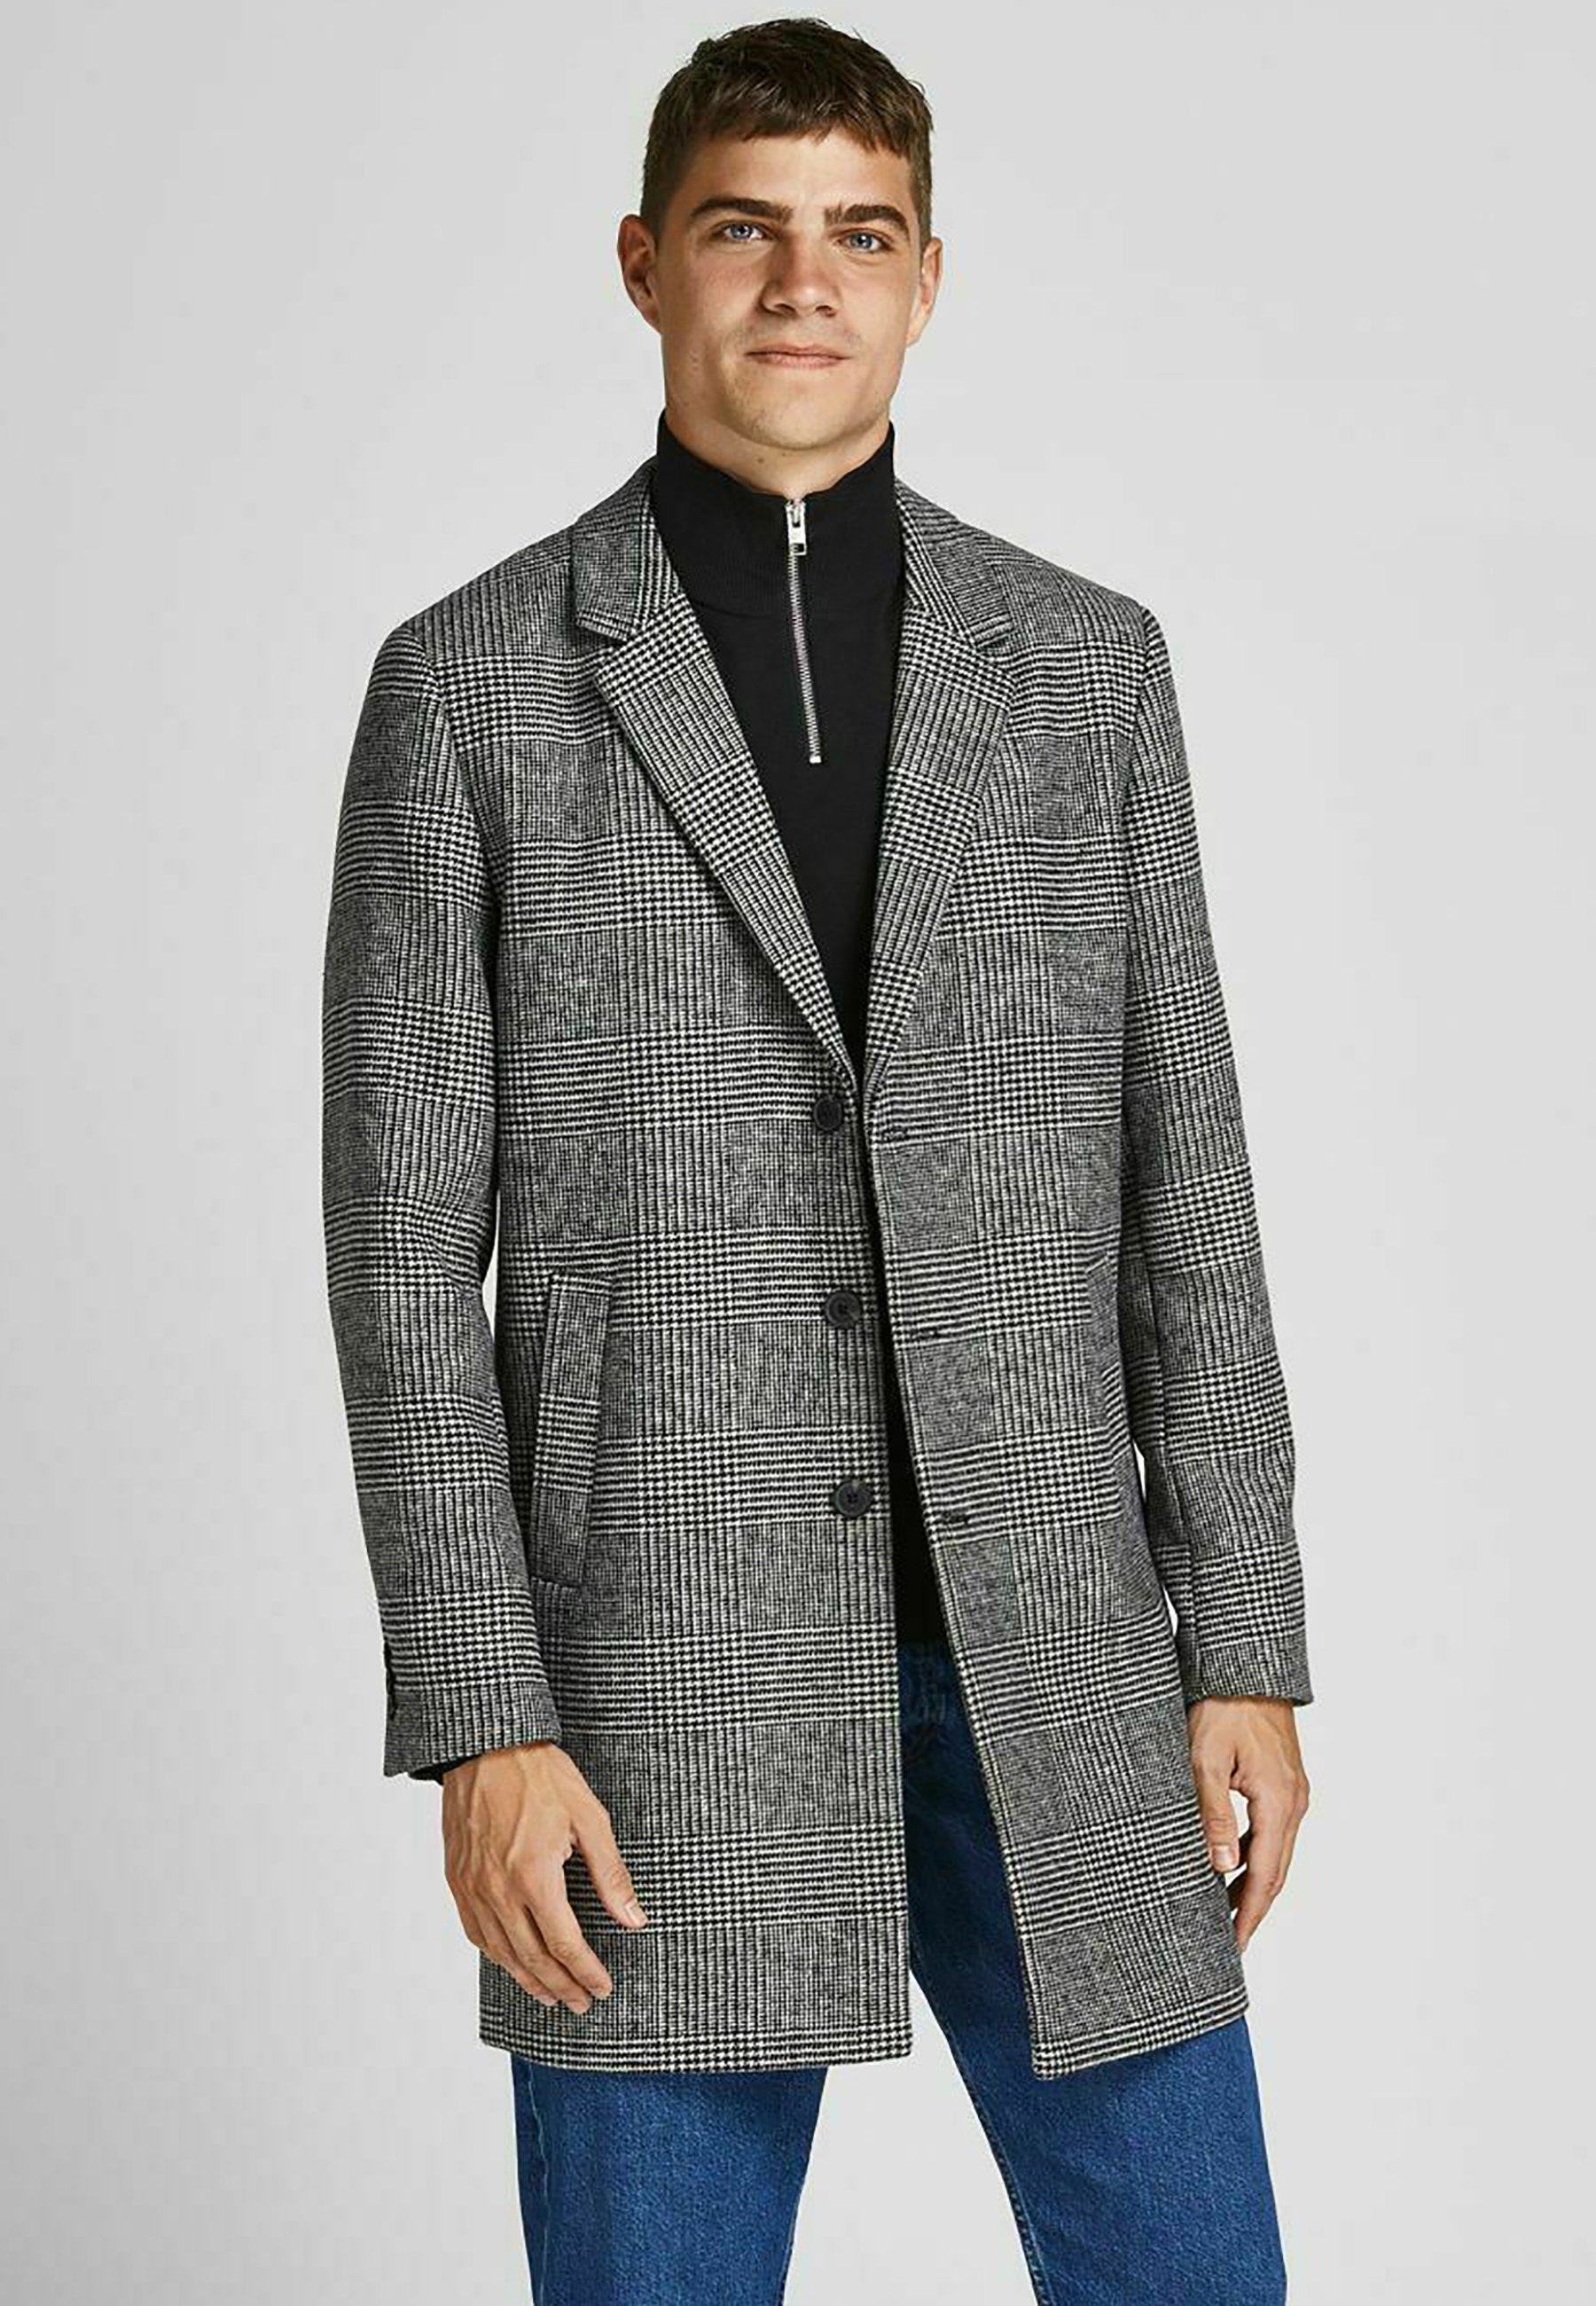 Homme JJEMOULDER COAT - Manteau classique - light grey melange